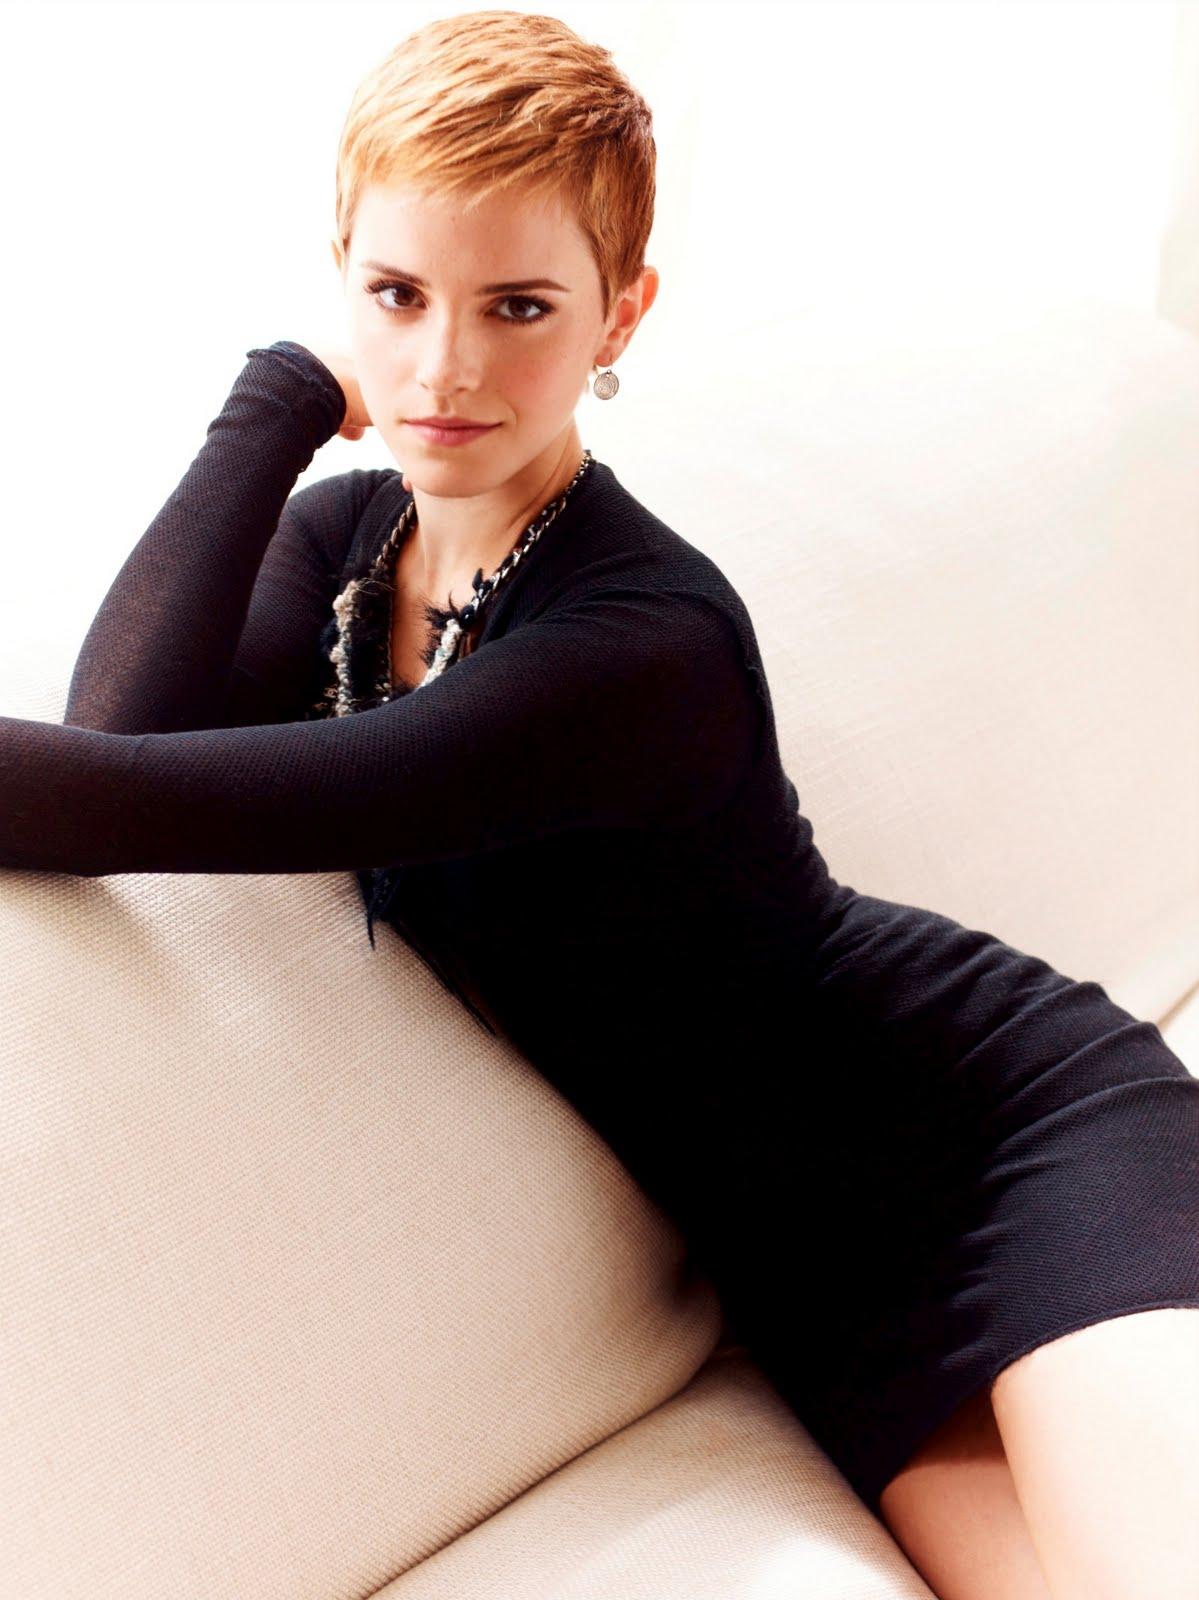 Emma Watson Hollywood Actress 40 Fantastic Photos: Seven Sleeps: Fashion Friday: Emma Watson